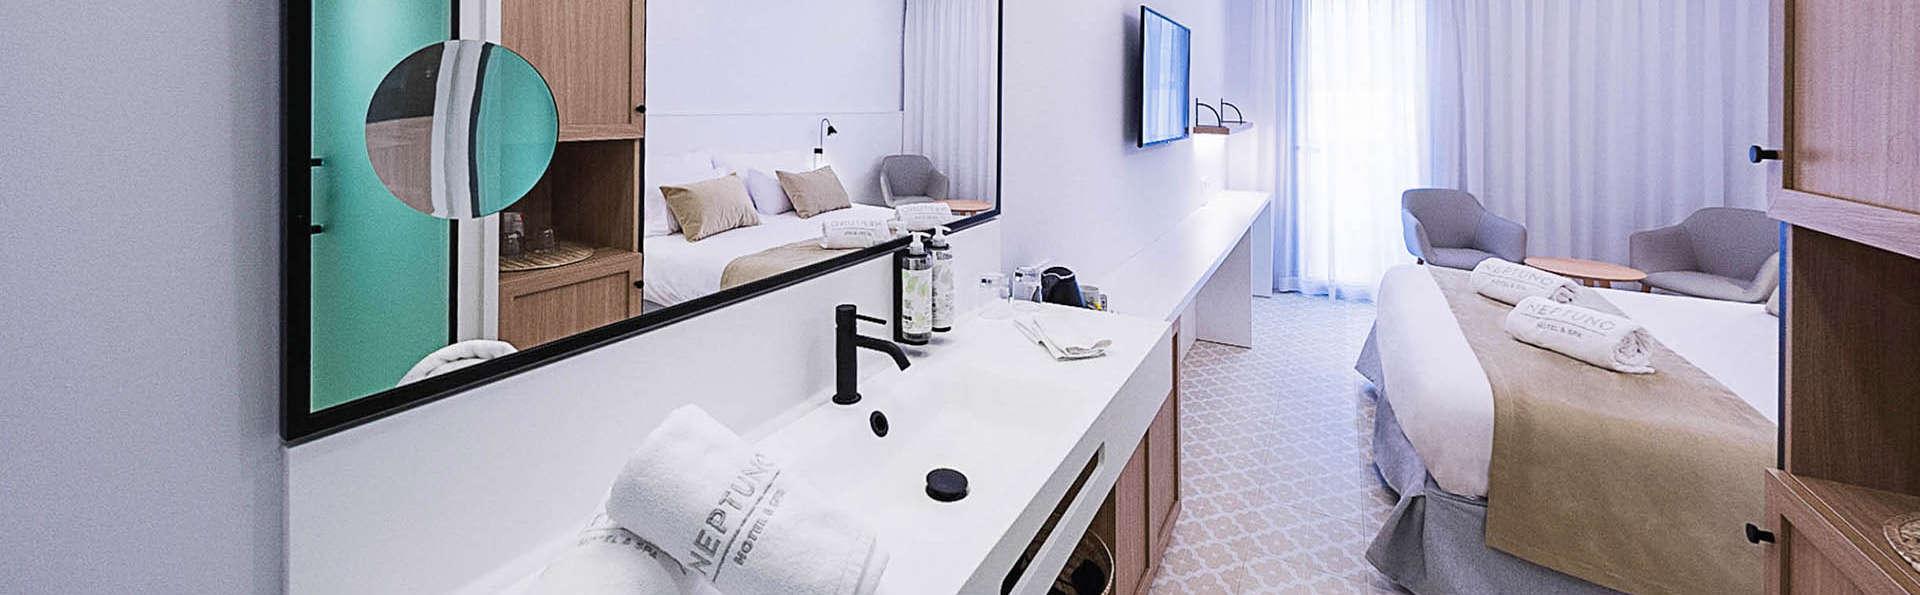 Neptuno Hotel & SPA - EDIT_ROOM_01.jpg